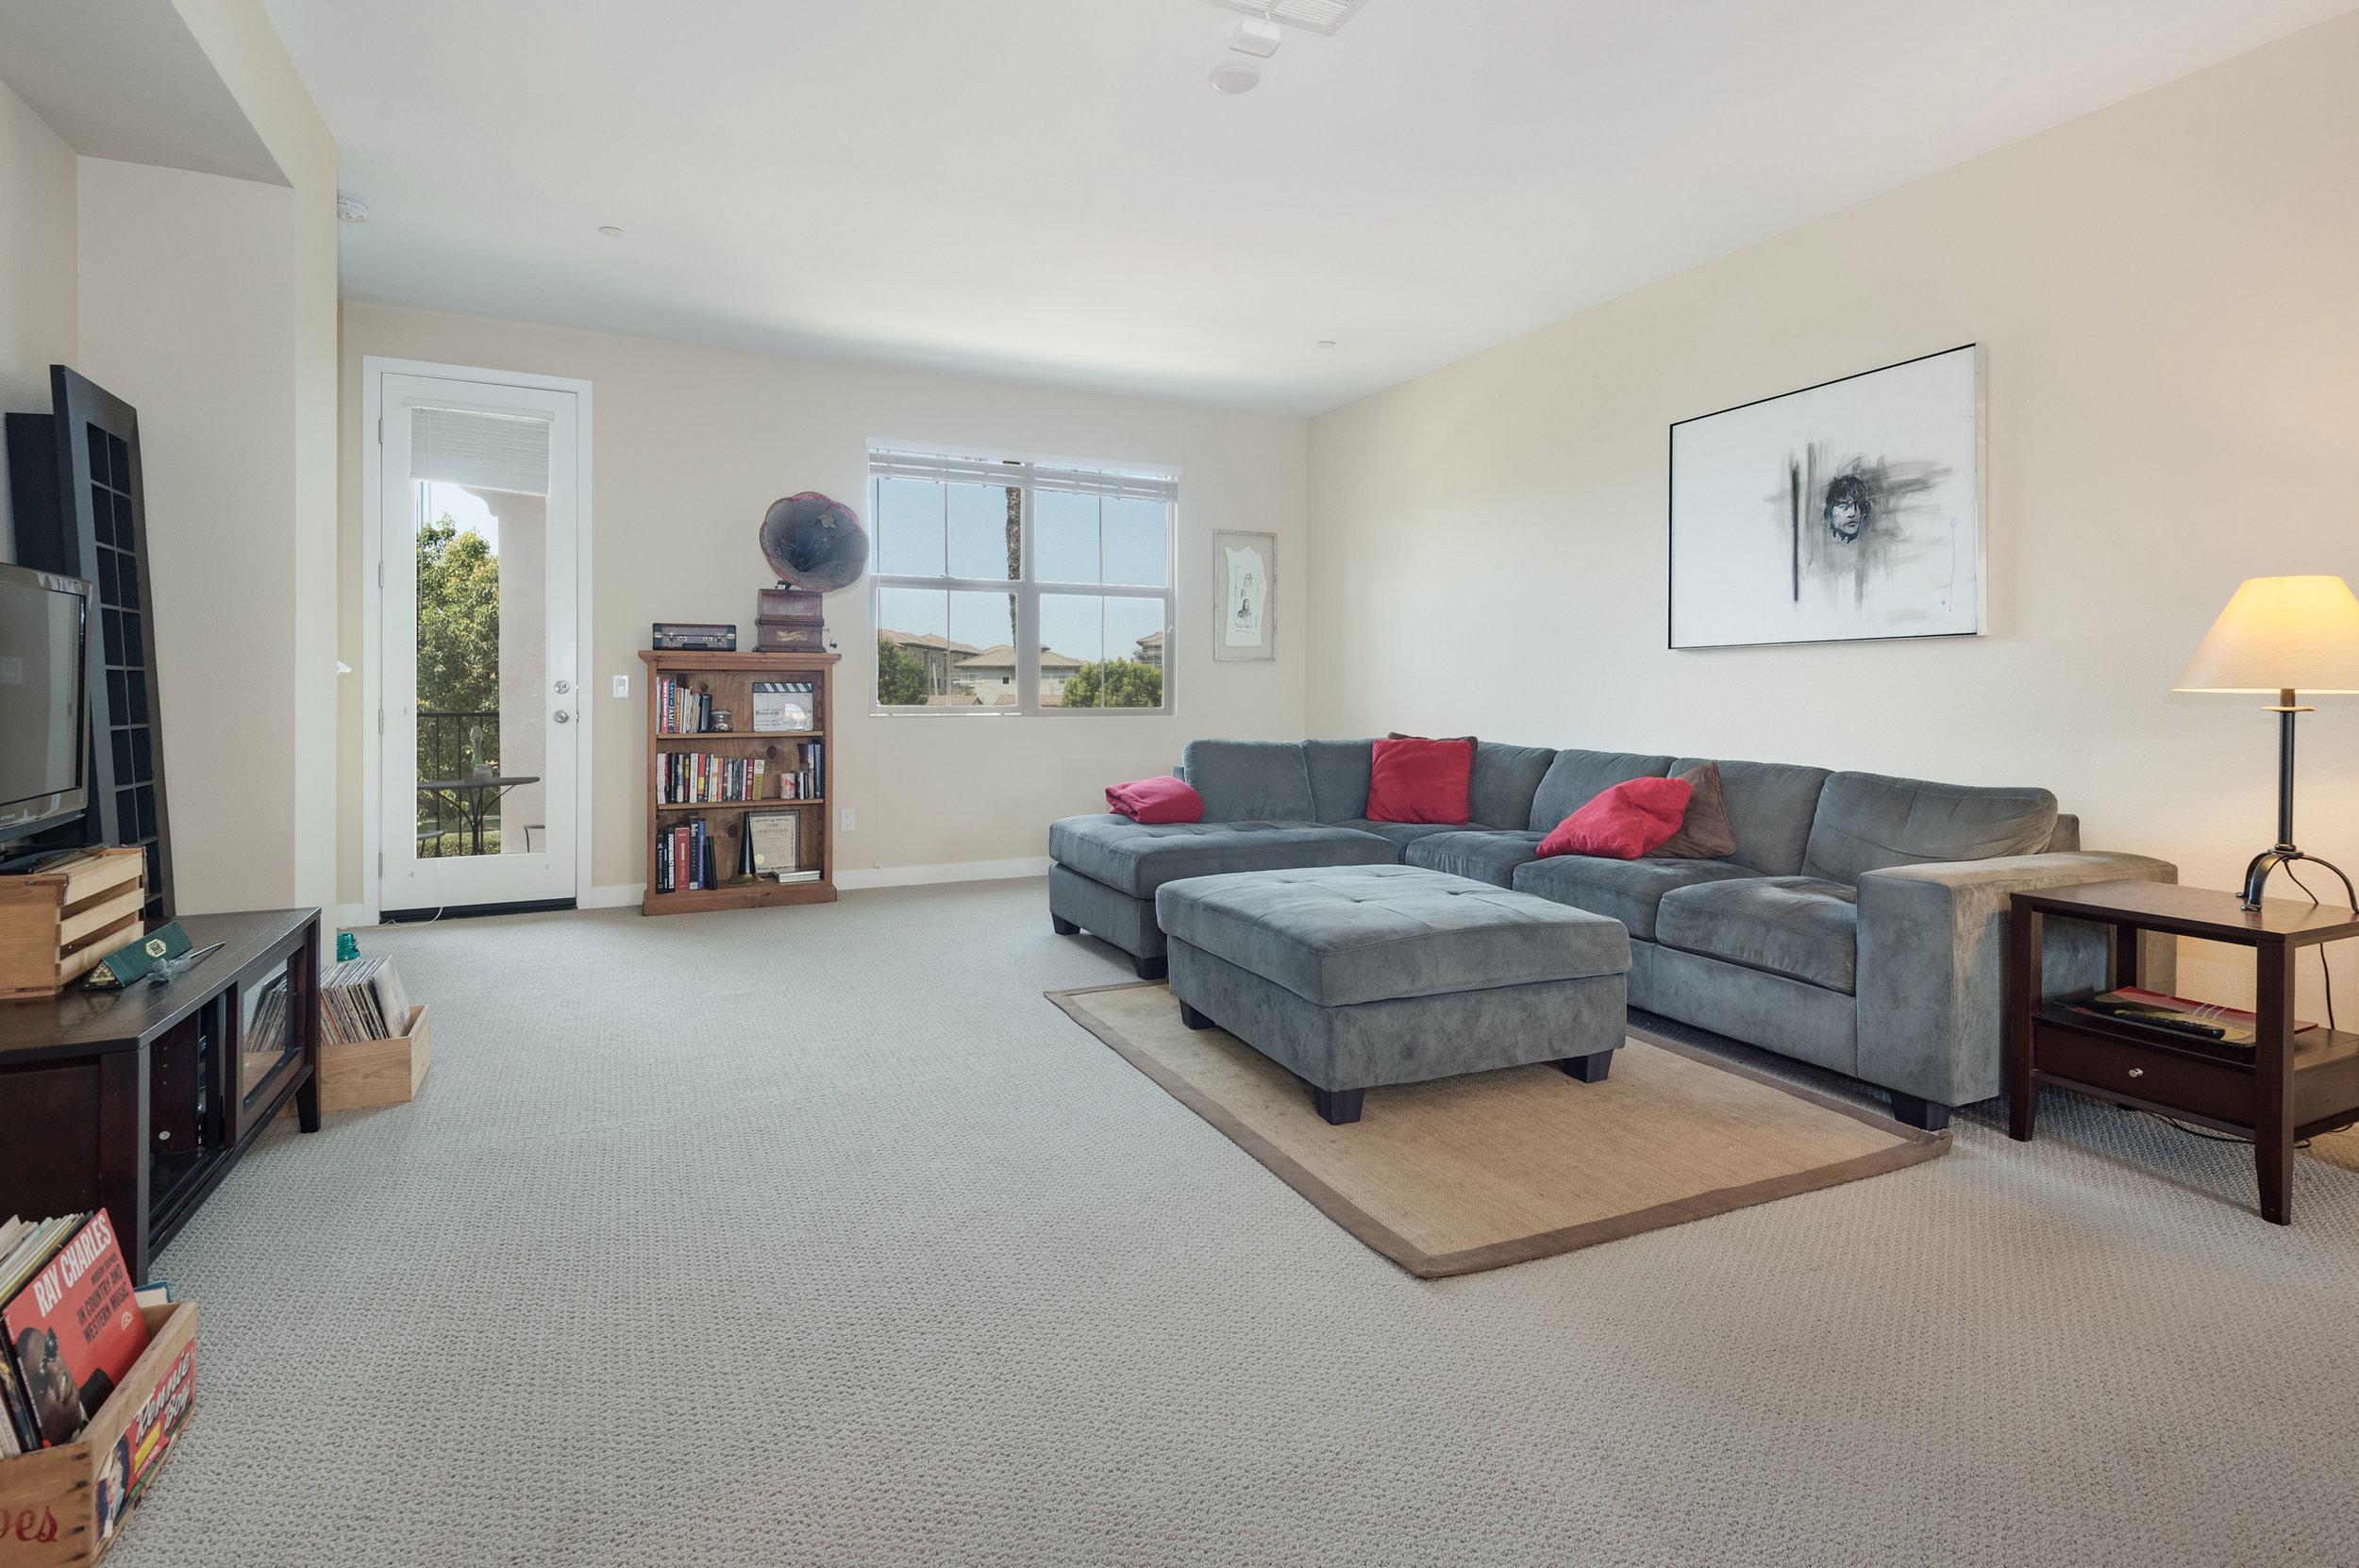 009 Living Room 207 Westpark Court Unit 702 Camarillo Bally Khehra For Sale Lease The Malibu Life Team Luxury Real Estate.jpg